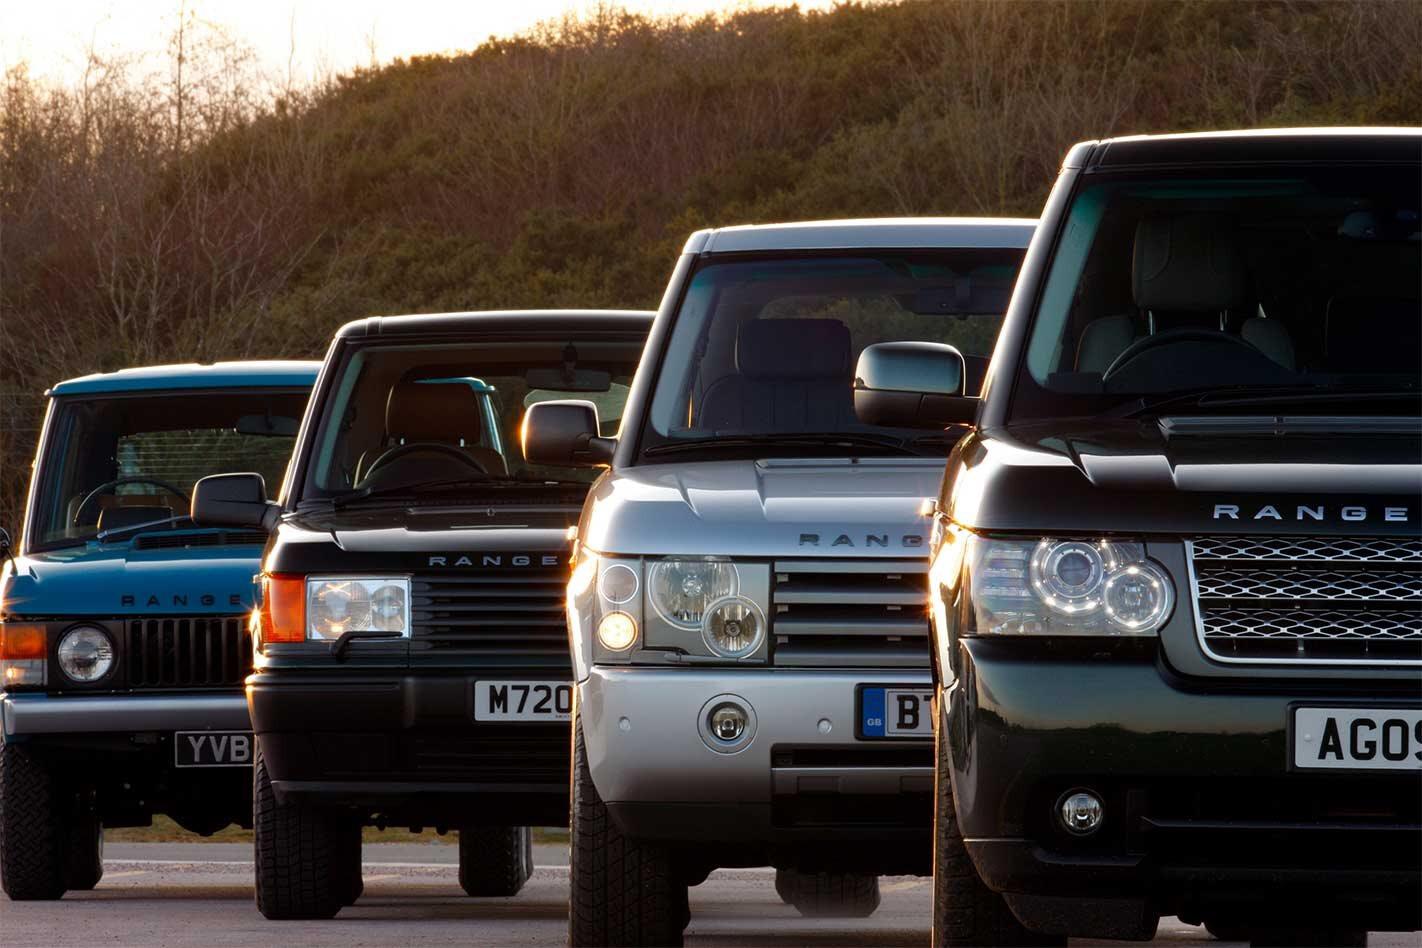 Celebrating 50 years of Range Rover